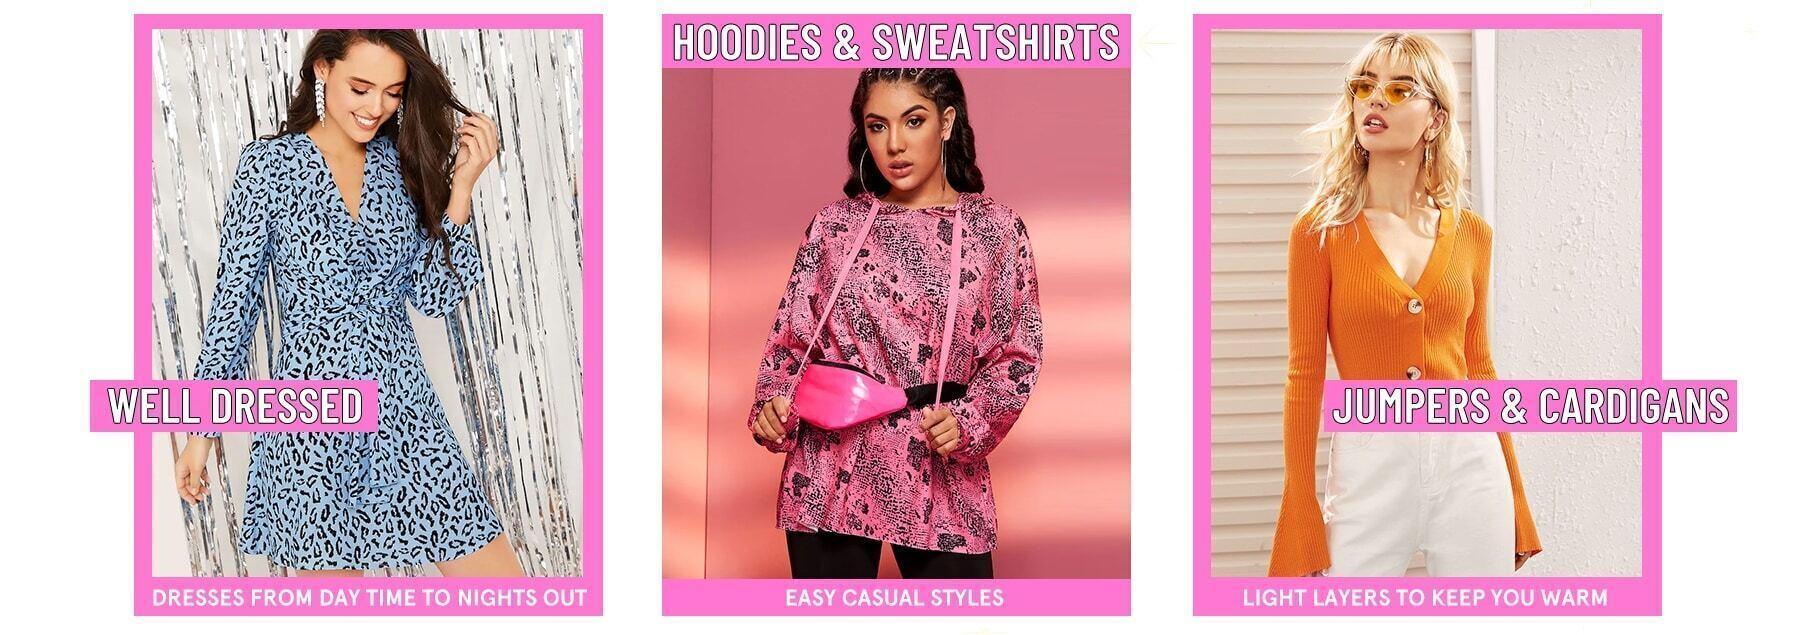 Women's & Men's Clothes, Shop Online Fashion | SHEIN UK